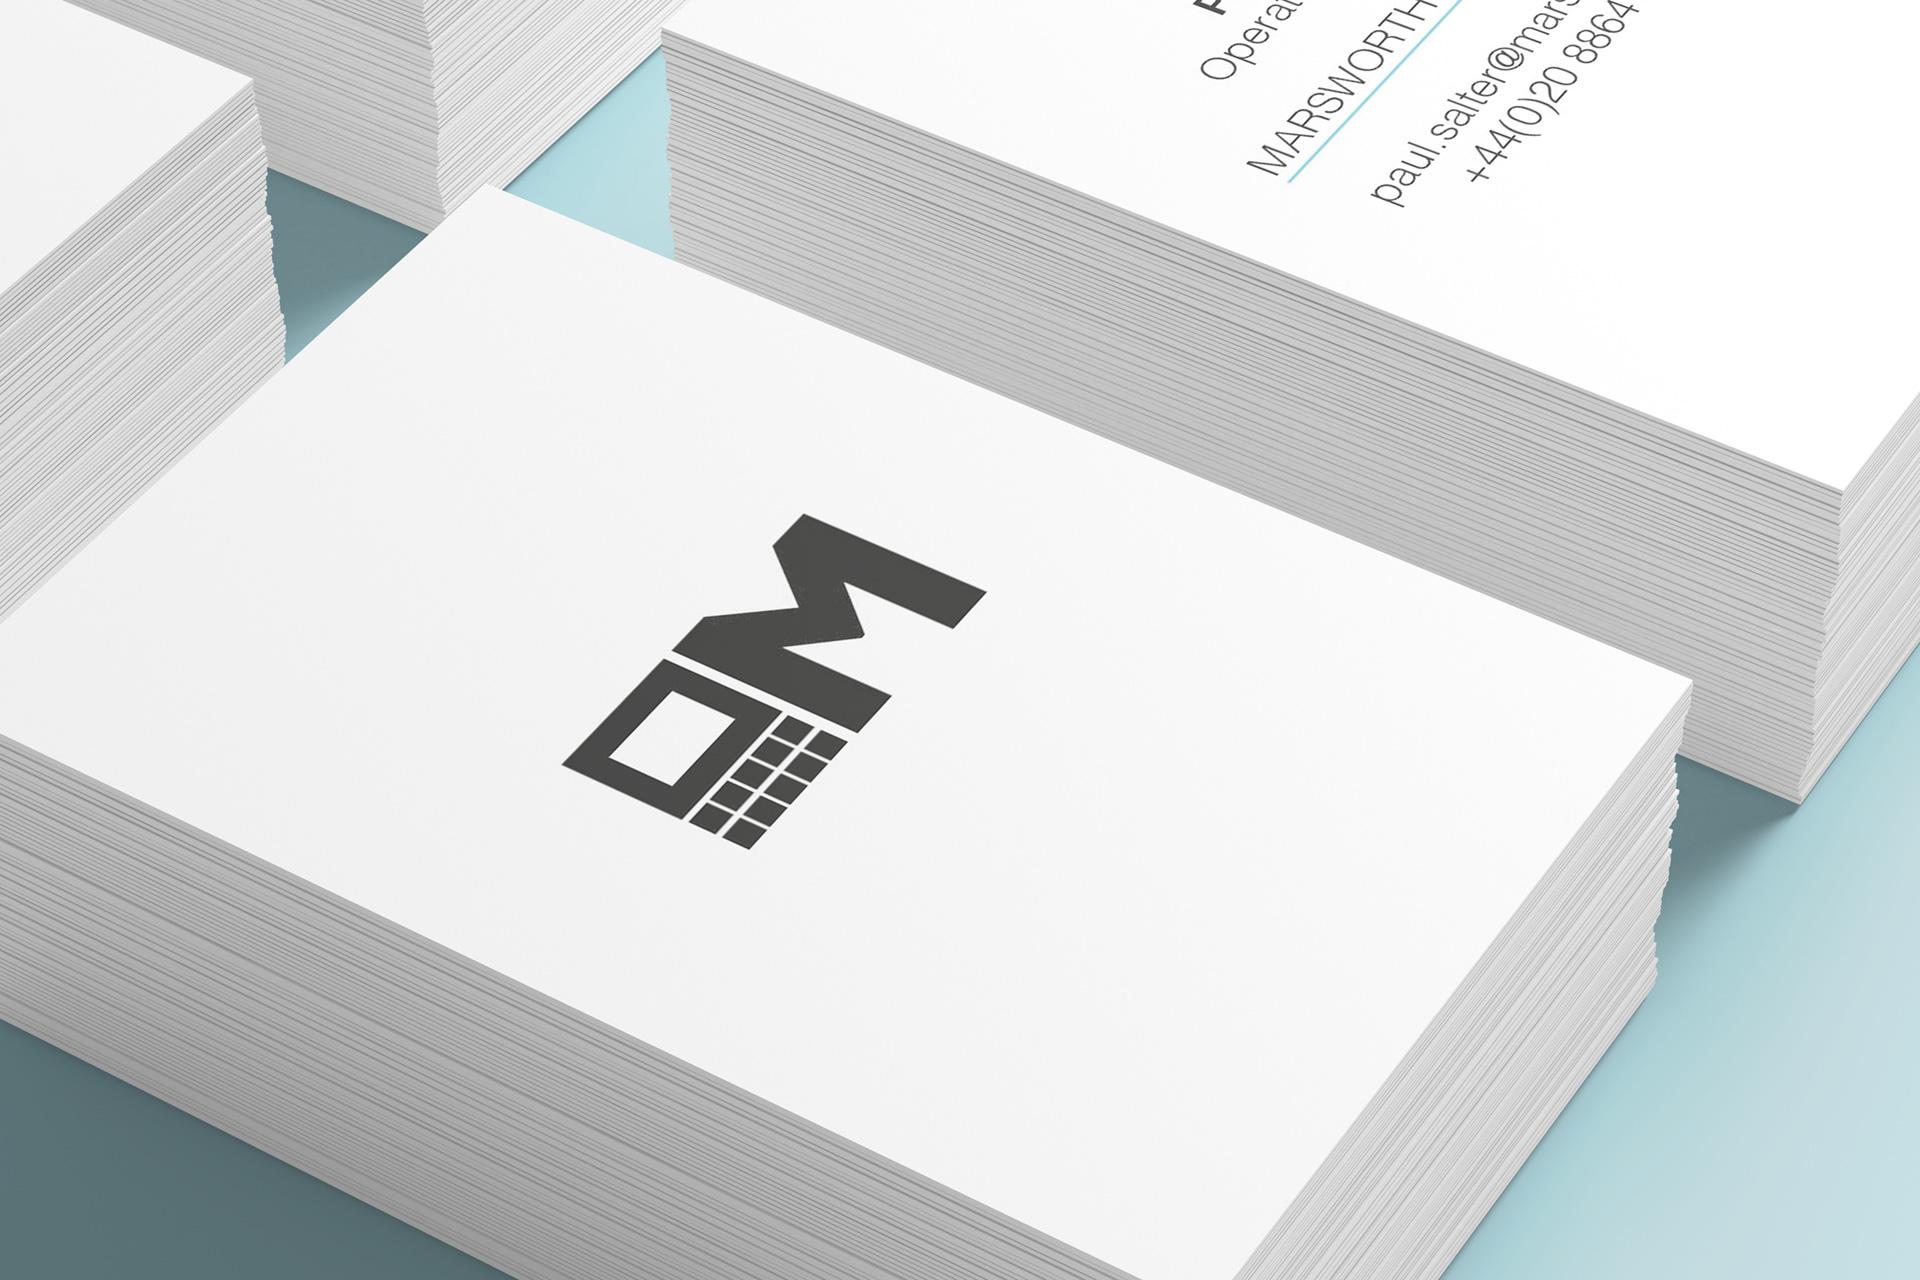 leesimmons-home-marsworth-branding-visual-identity-design2.jpg